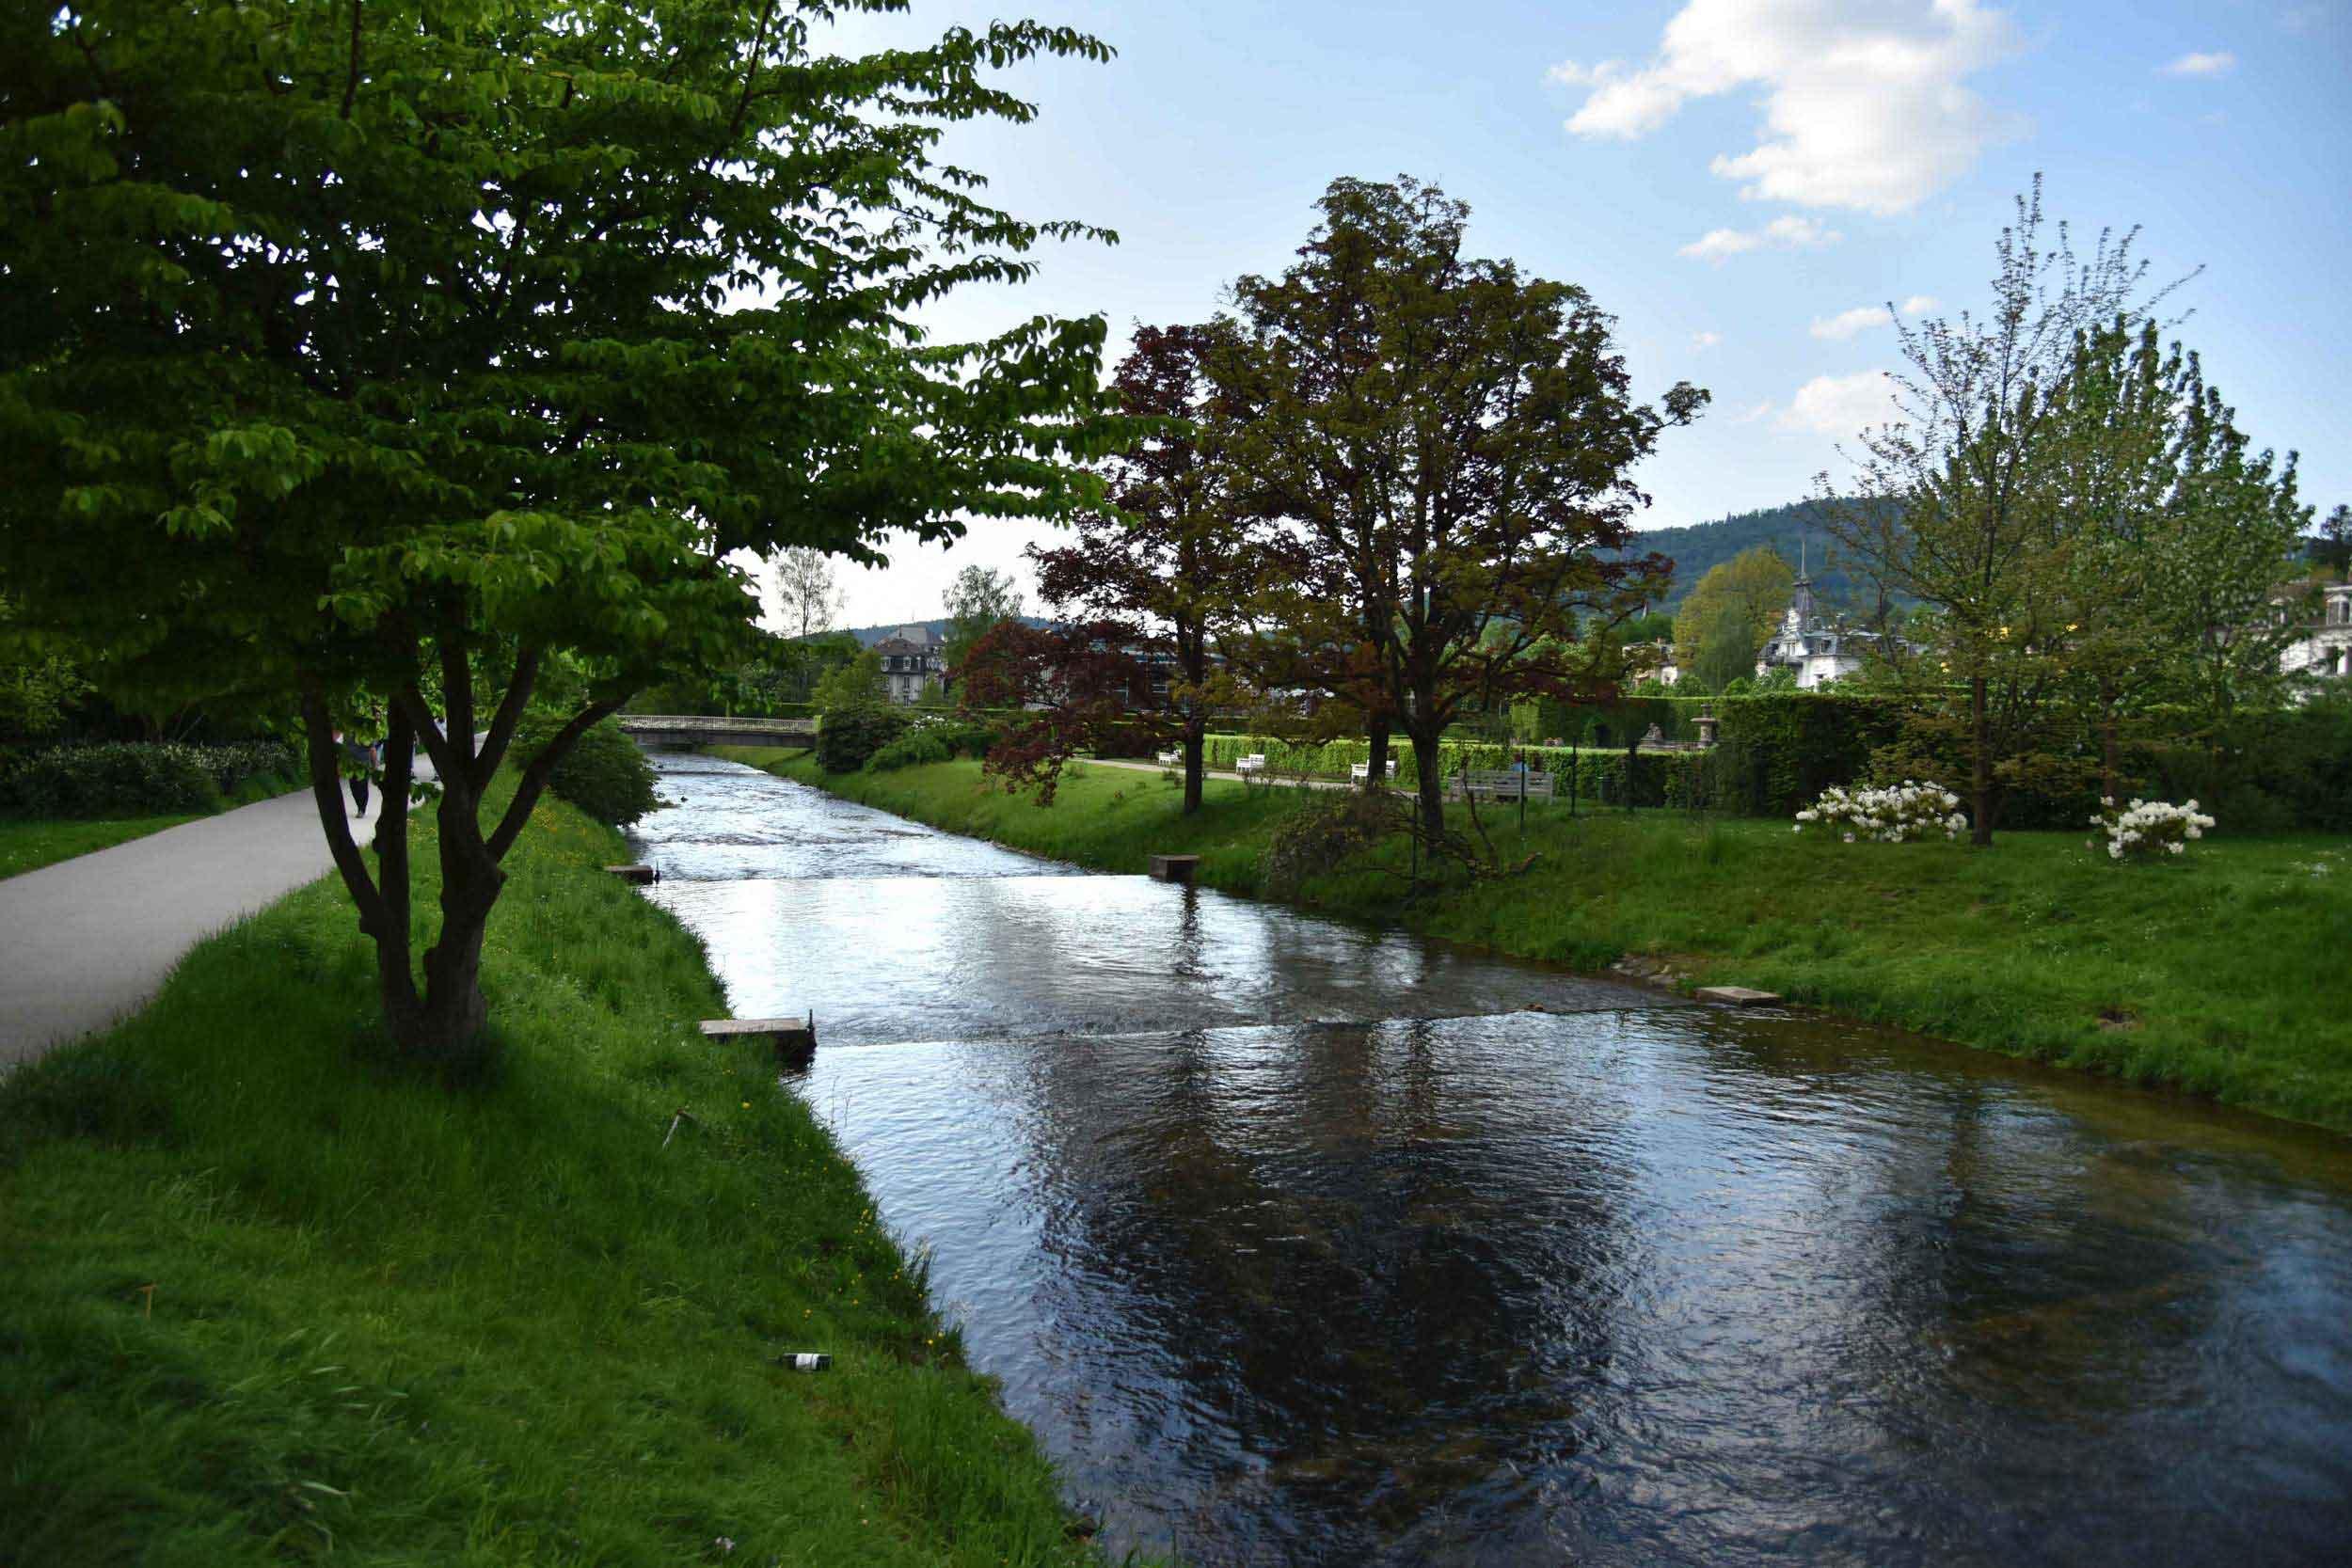 Oos river,Baden Baden, Germany. Image©thingstodot.com